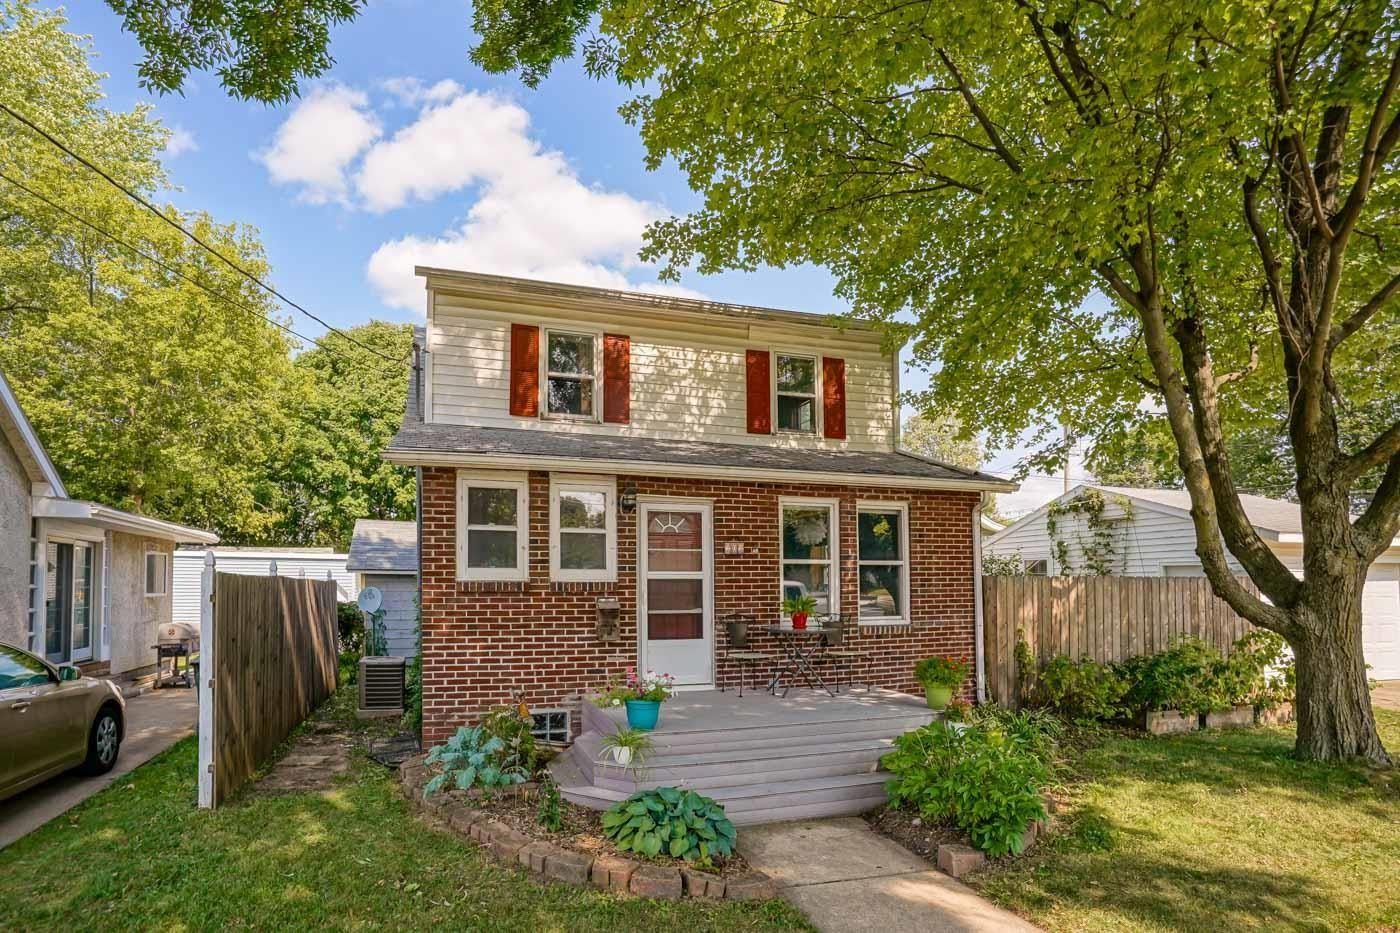 202 Oak St, Madison, WI 53704 - #: 1919846